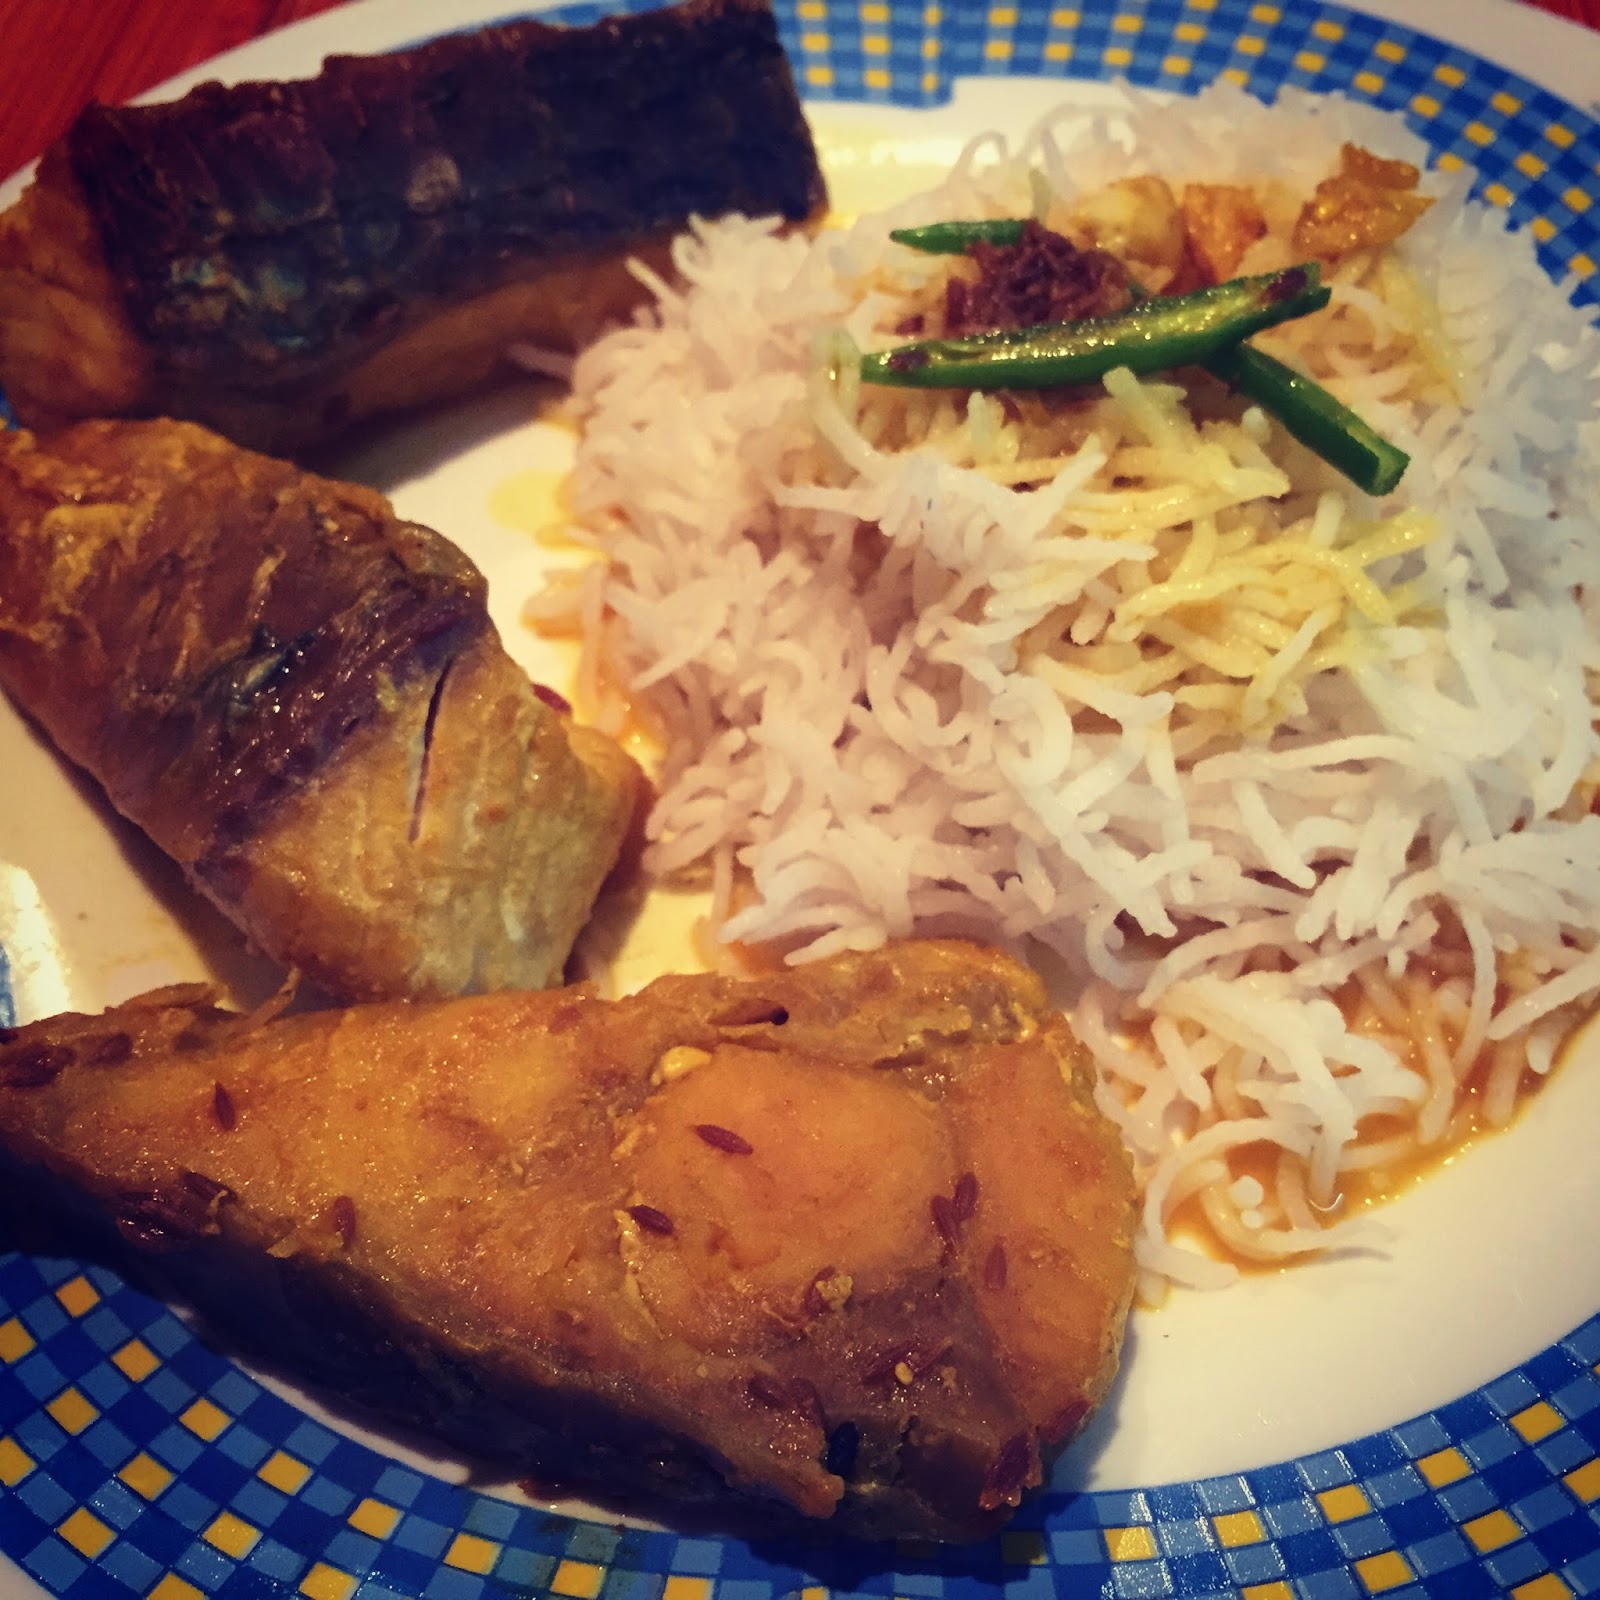 Patla Machher Jhol A Bengali Fish Curry Recipe With 1 2 A Teaspoon